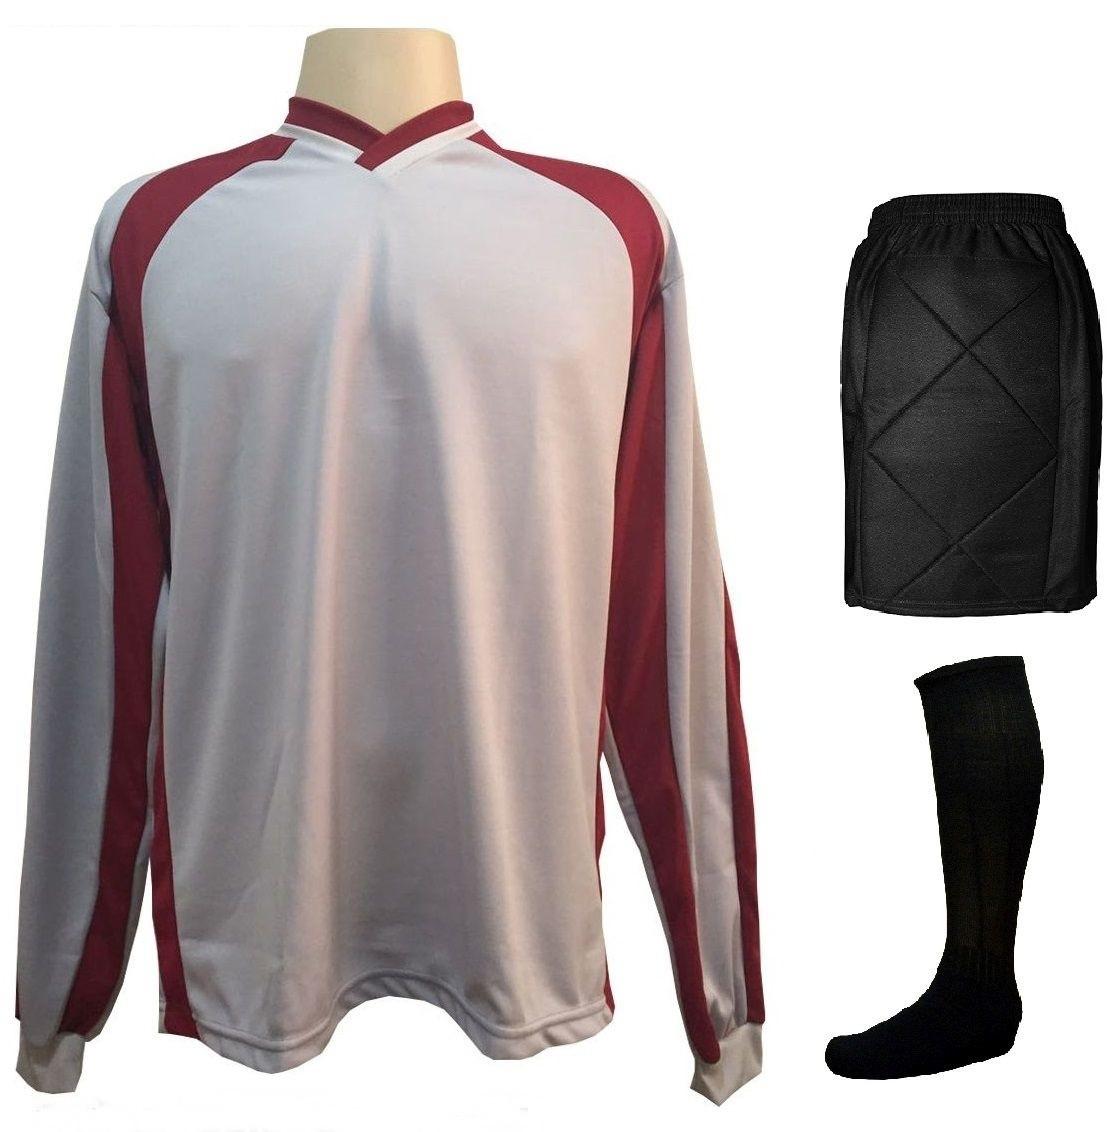 Fardamento Completo modelo City 18+1 (18 Camisas Royal/Branco + 18 Calções Copa Royal/Branco + 18 Pares de Meiões Royal + 1 Conjunto de Goleiro) + Brindes